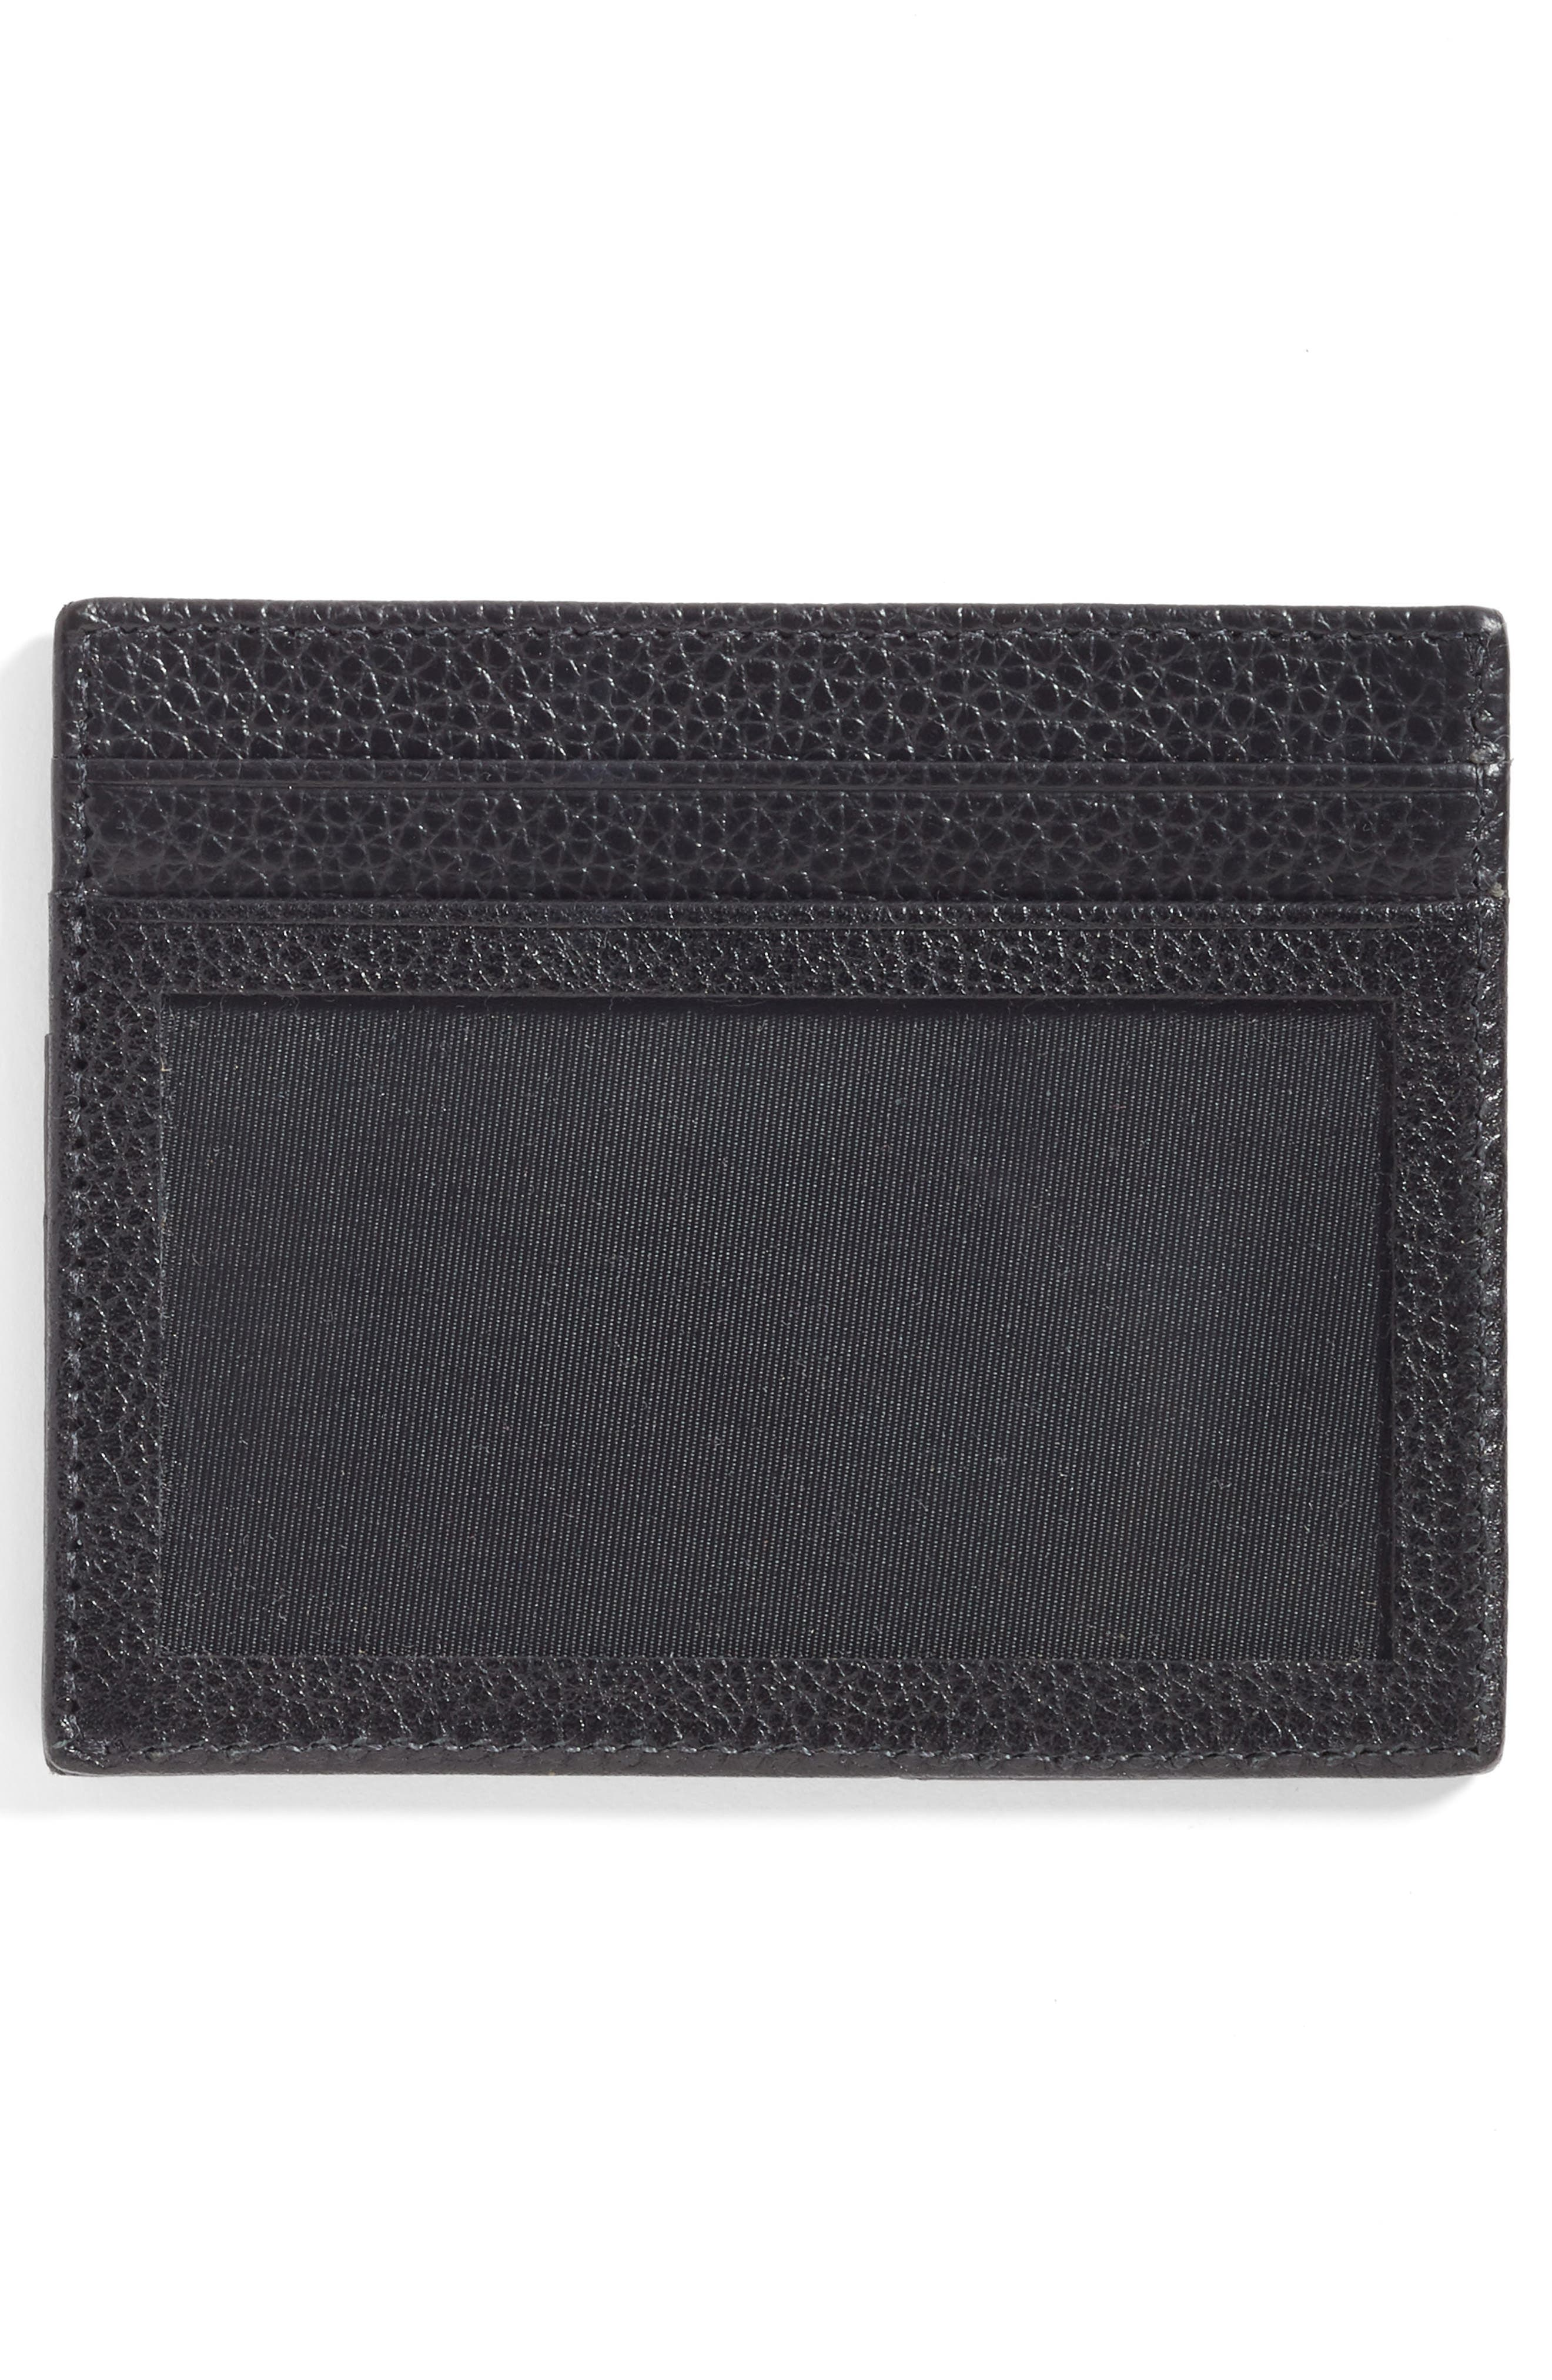 Executive Leather Card Case,                             Alternate thumbnail 5, color,